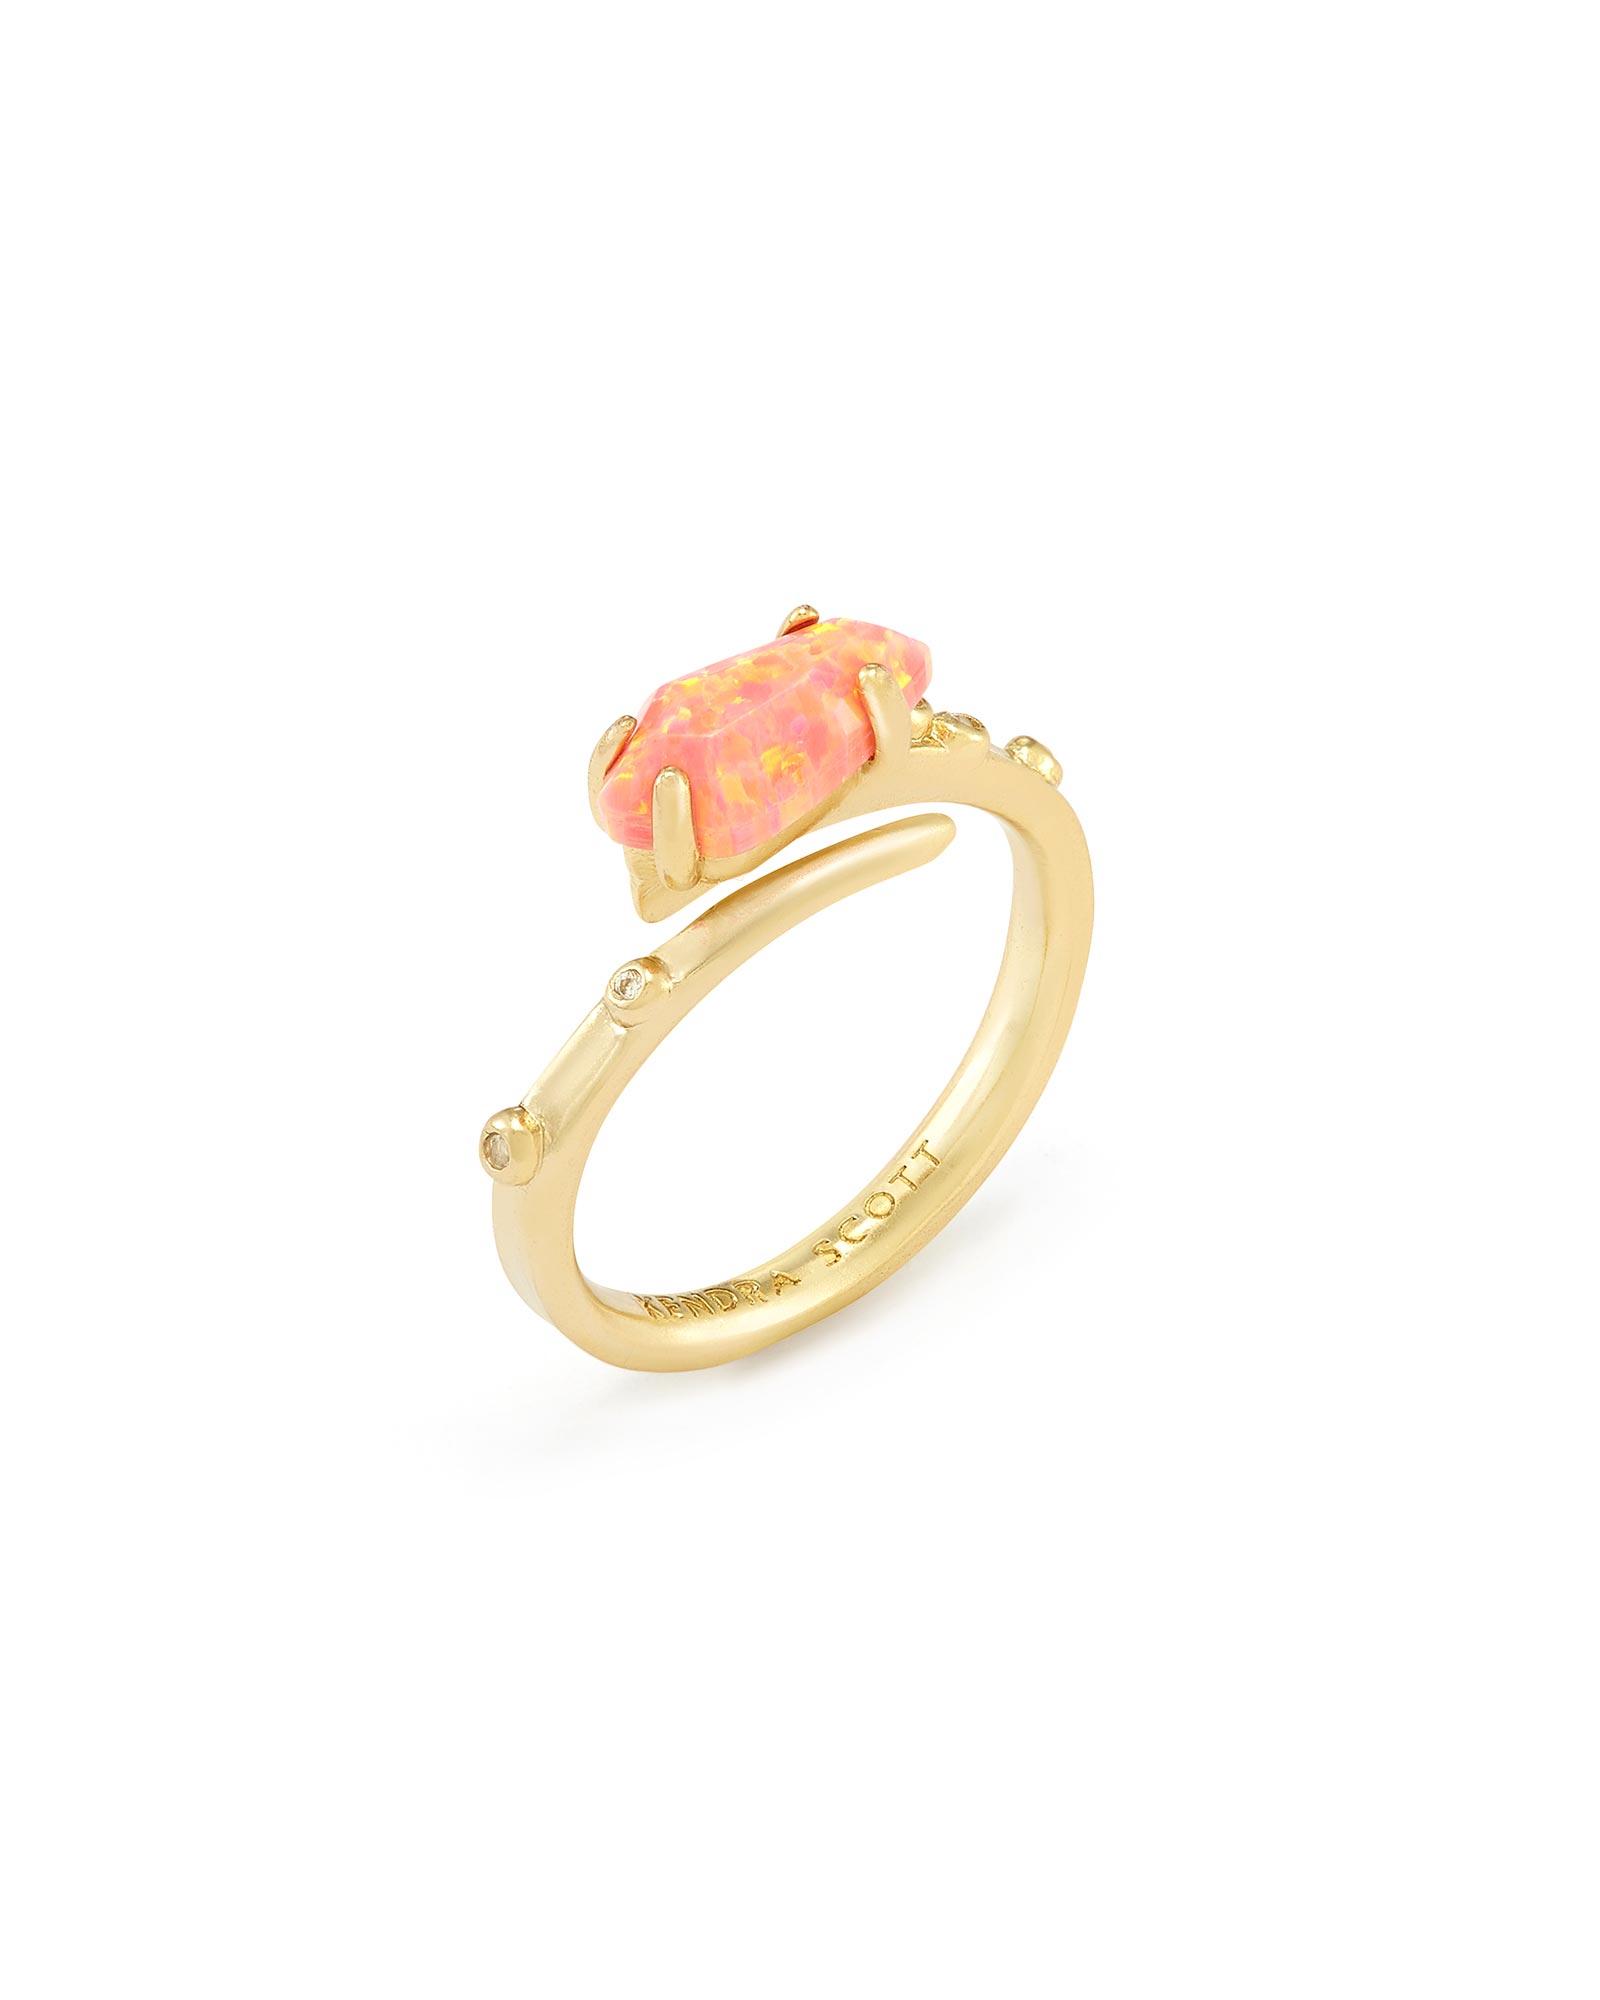 Kendra Scott Julia Stone Ring Sghfu1OpP